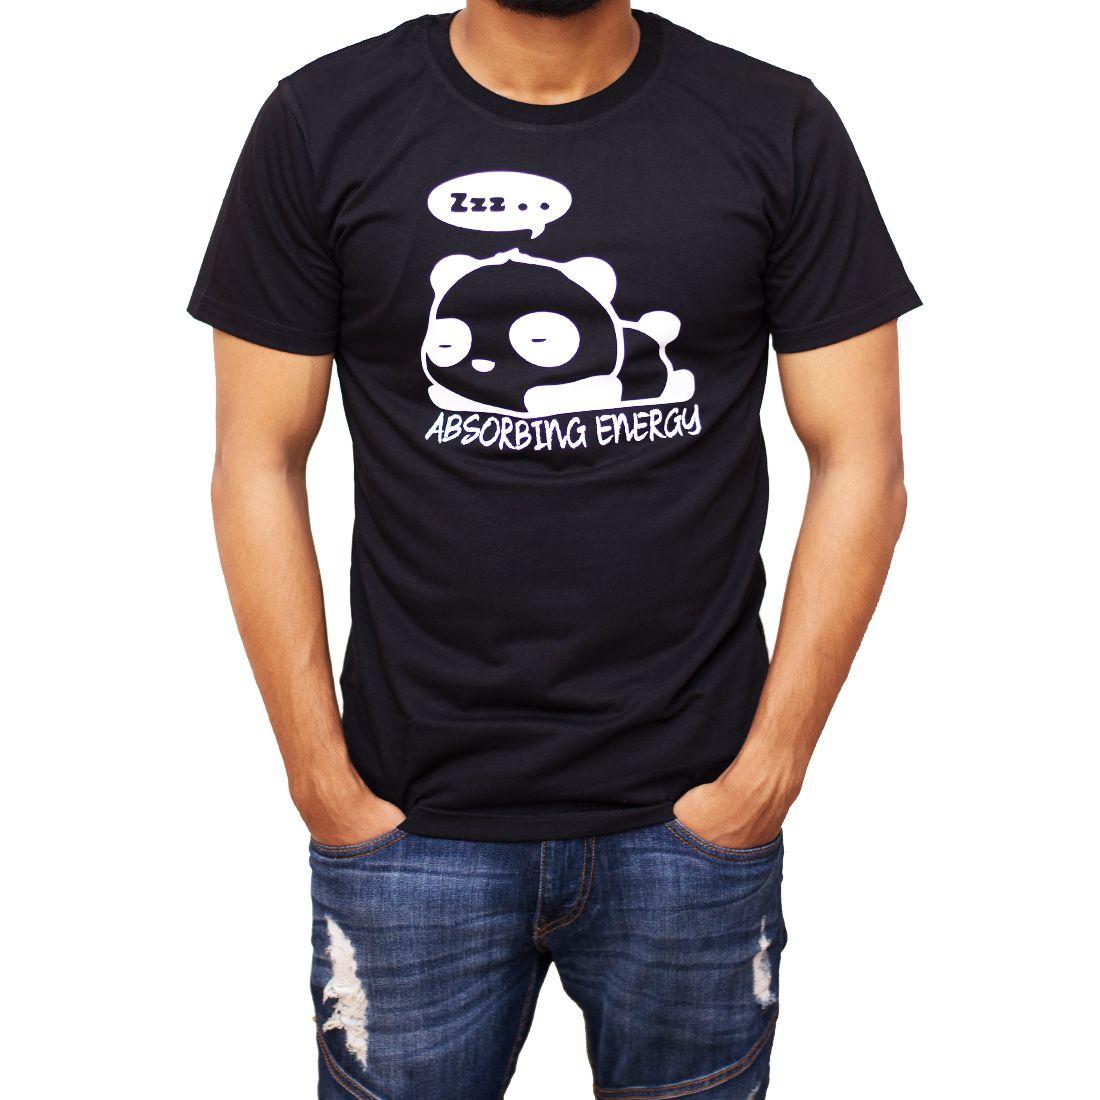 BongTees Black Round T-Shirt Pack of 1